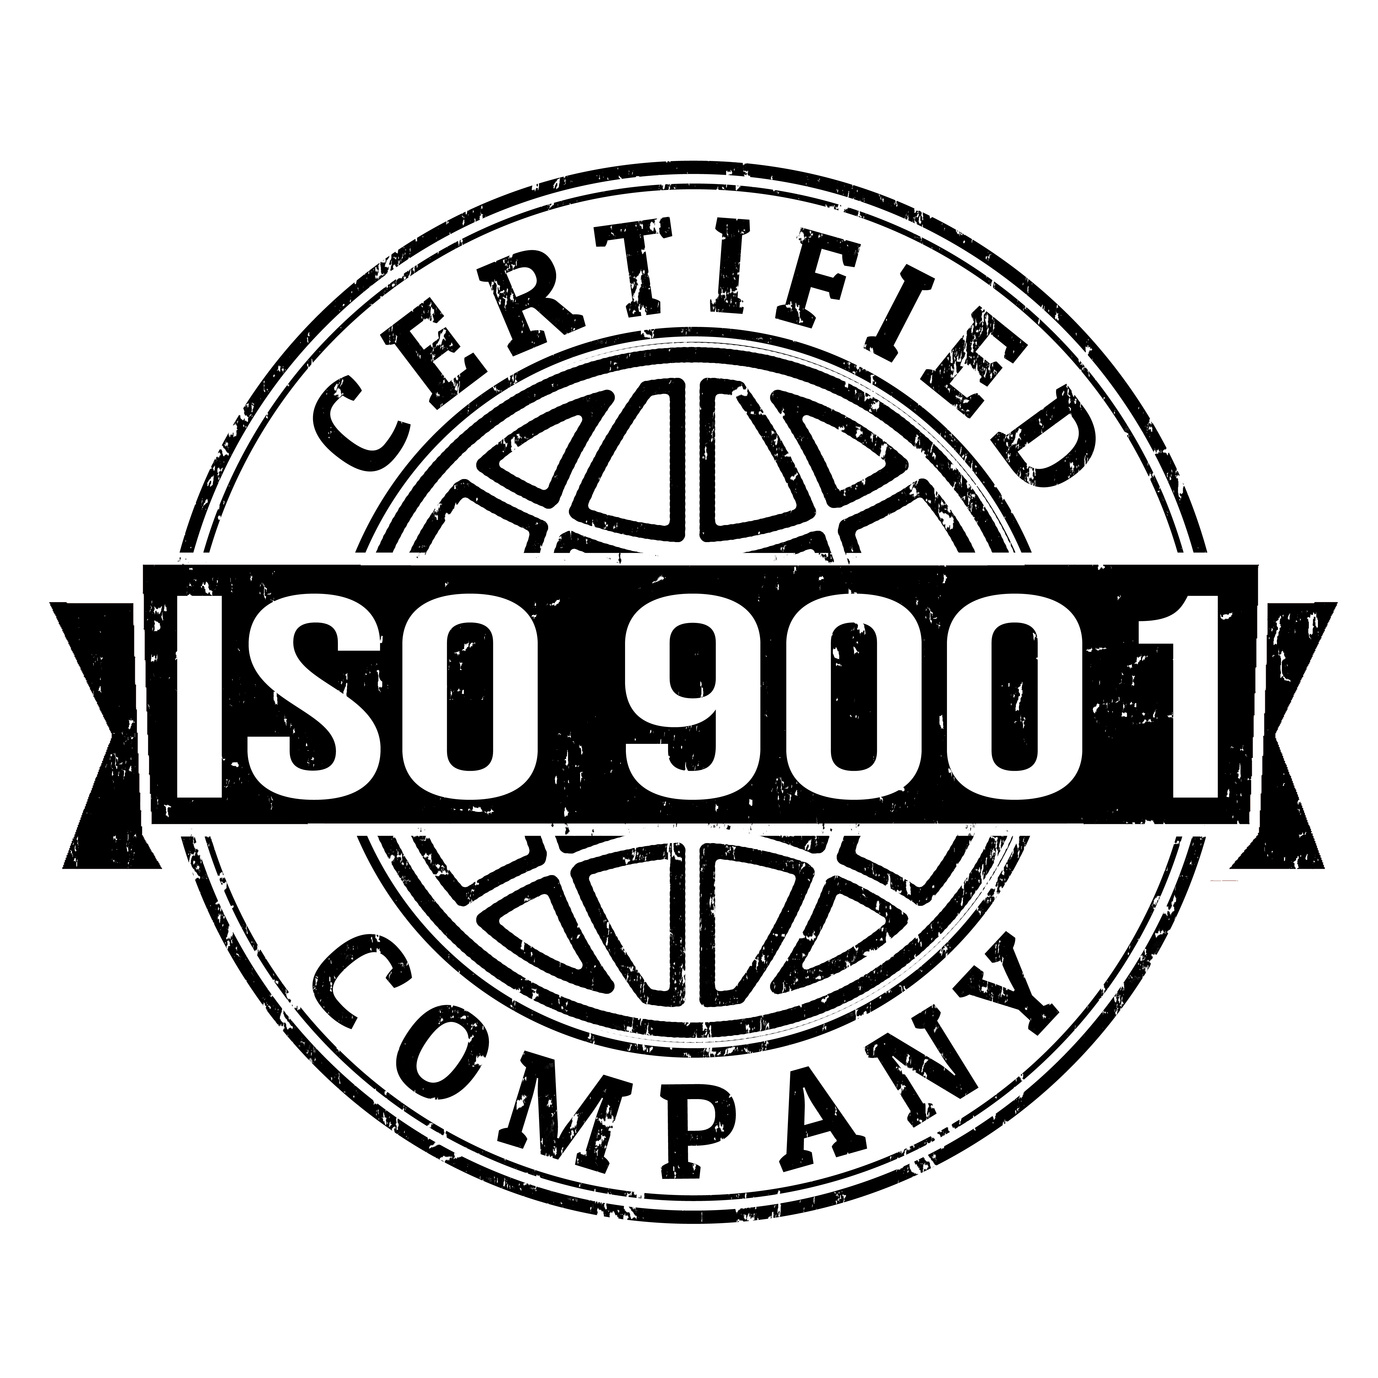 Marlin Steel Has a New ISO 9001:2015 Certificate